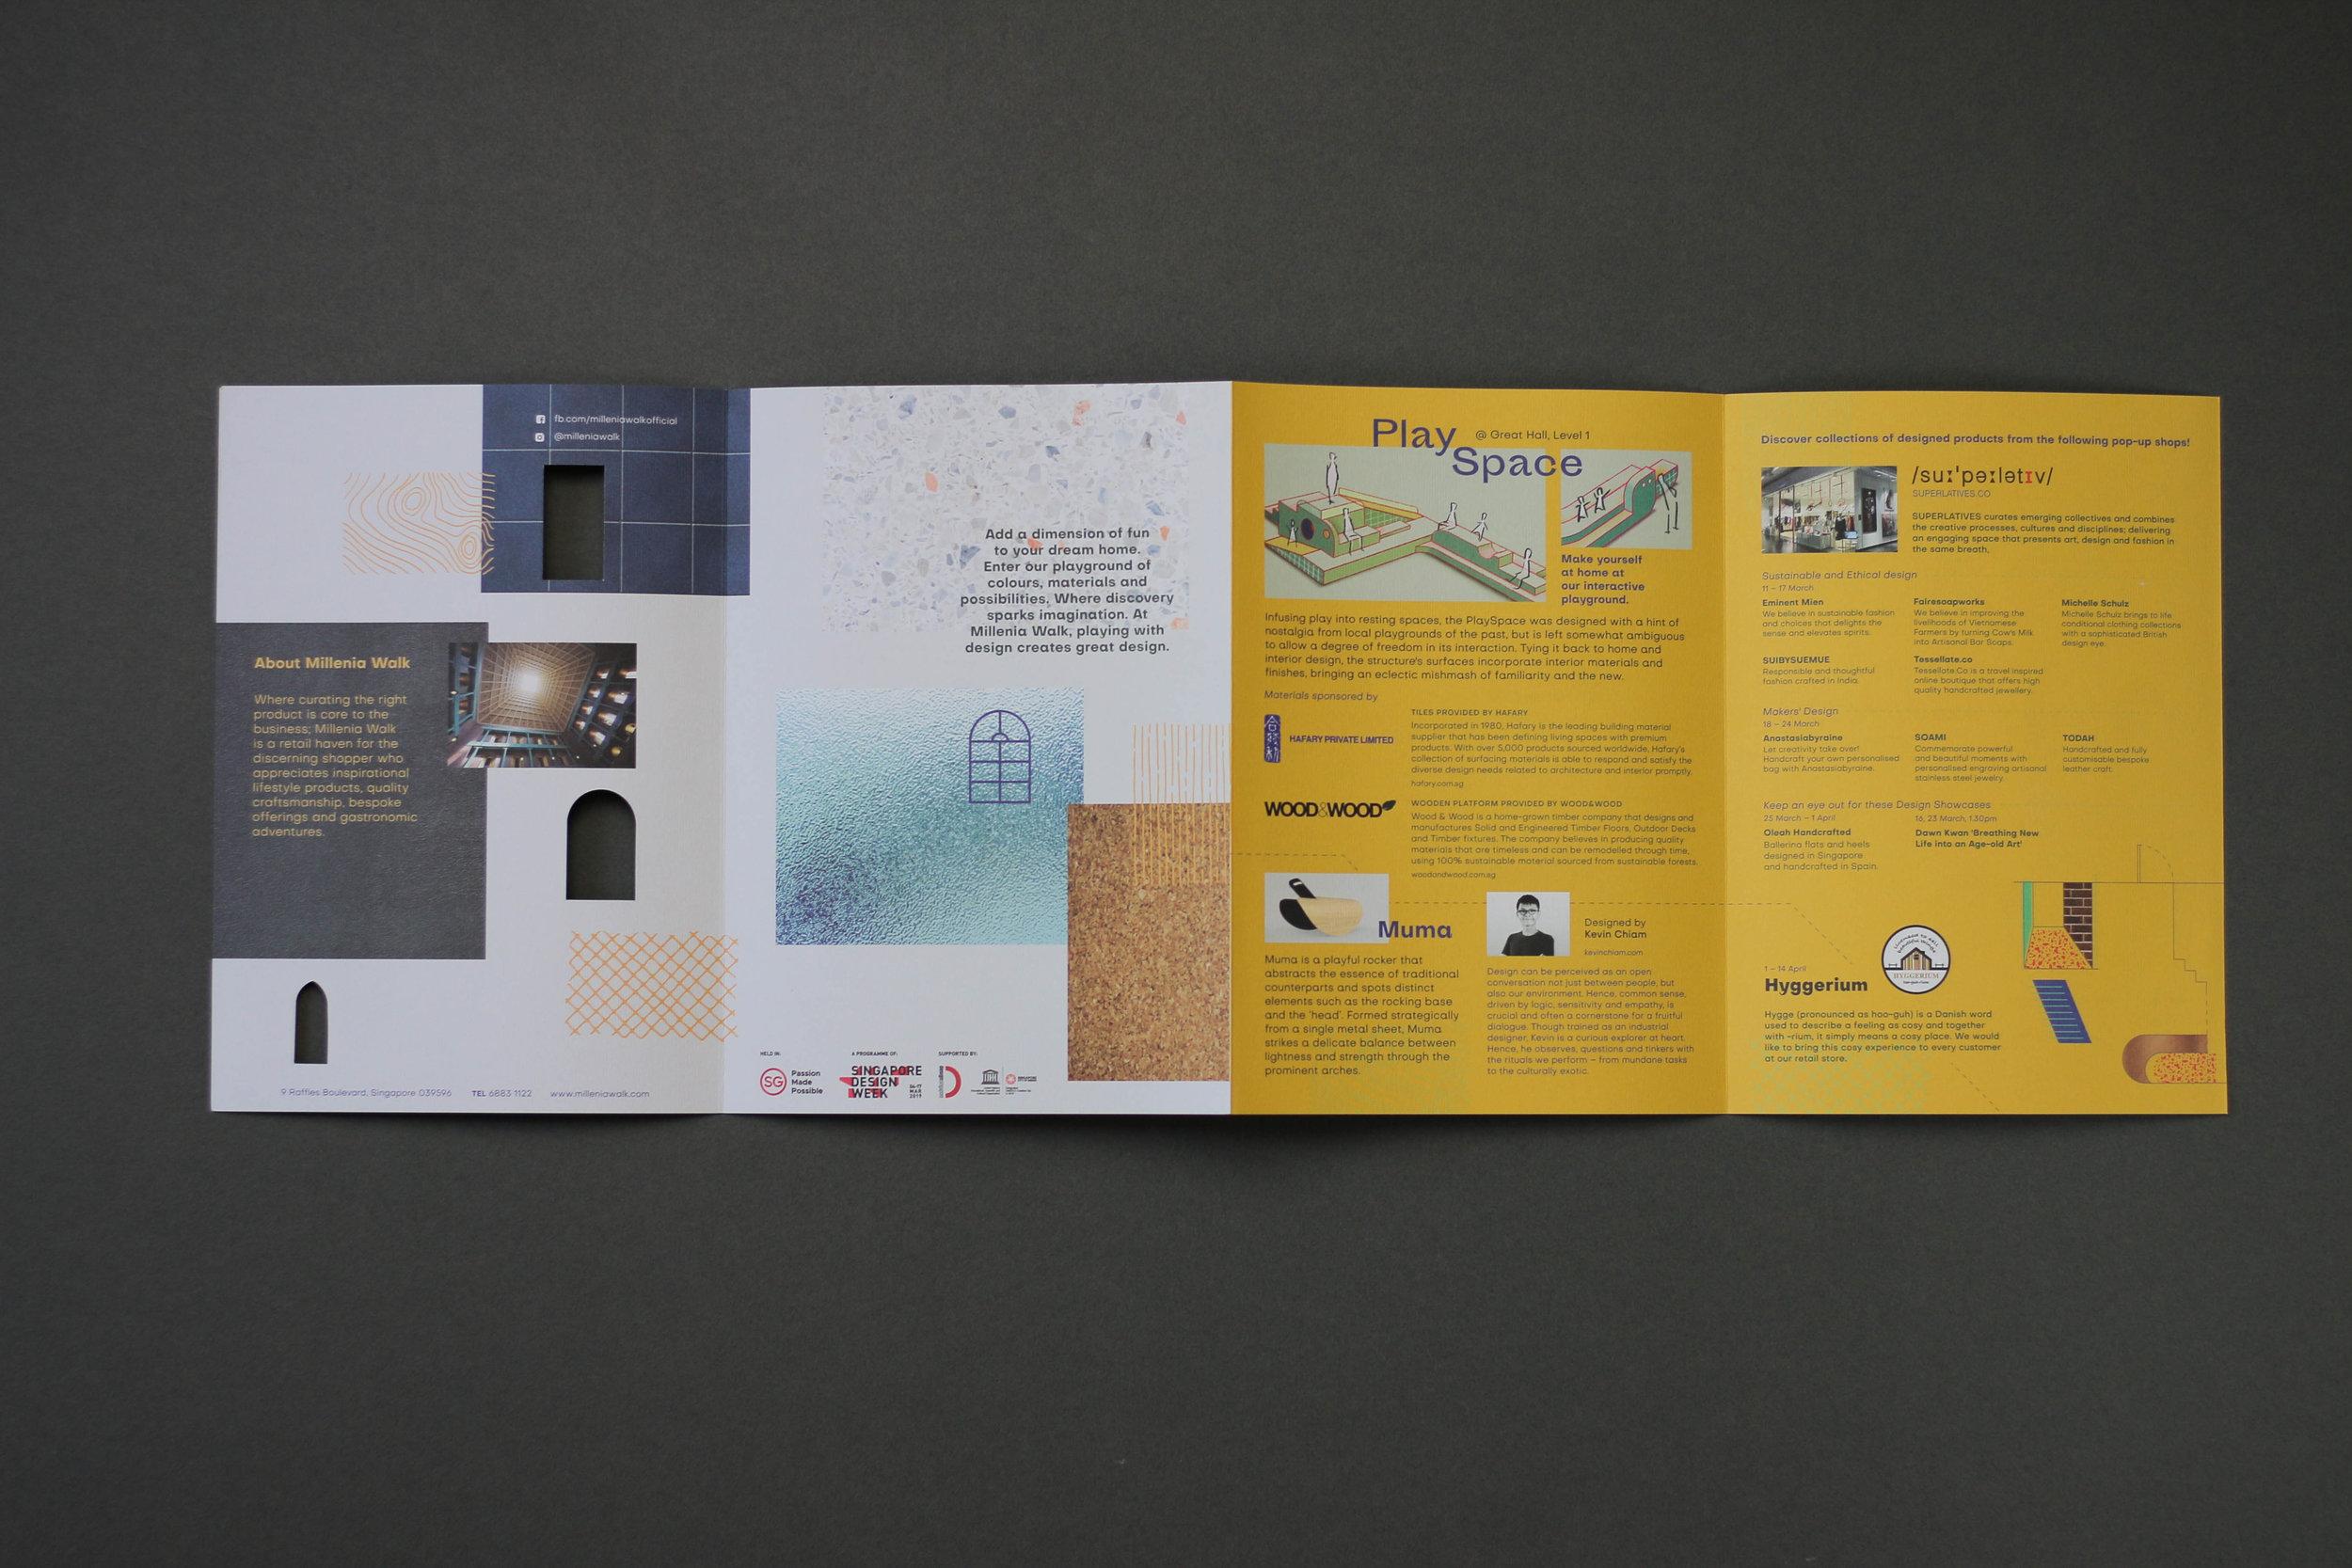 outeredit - millenia walk design play space - brochure open